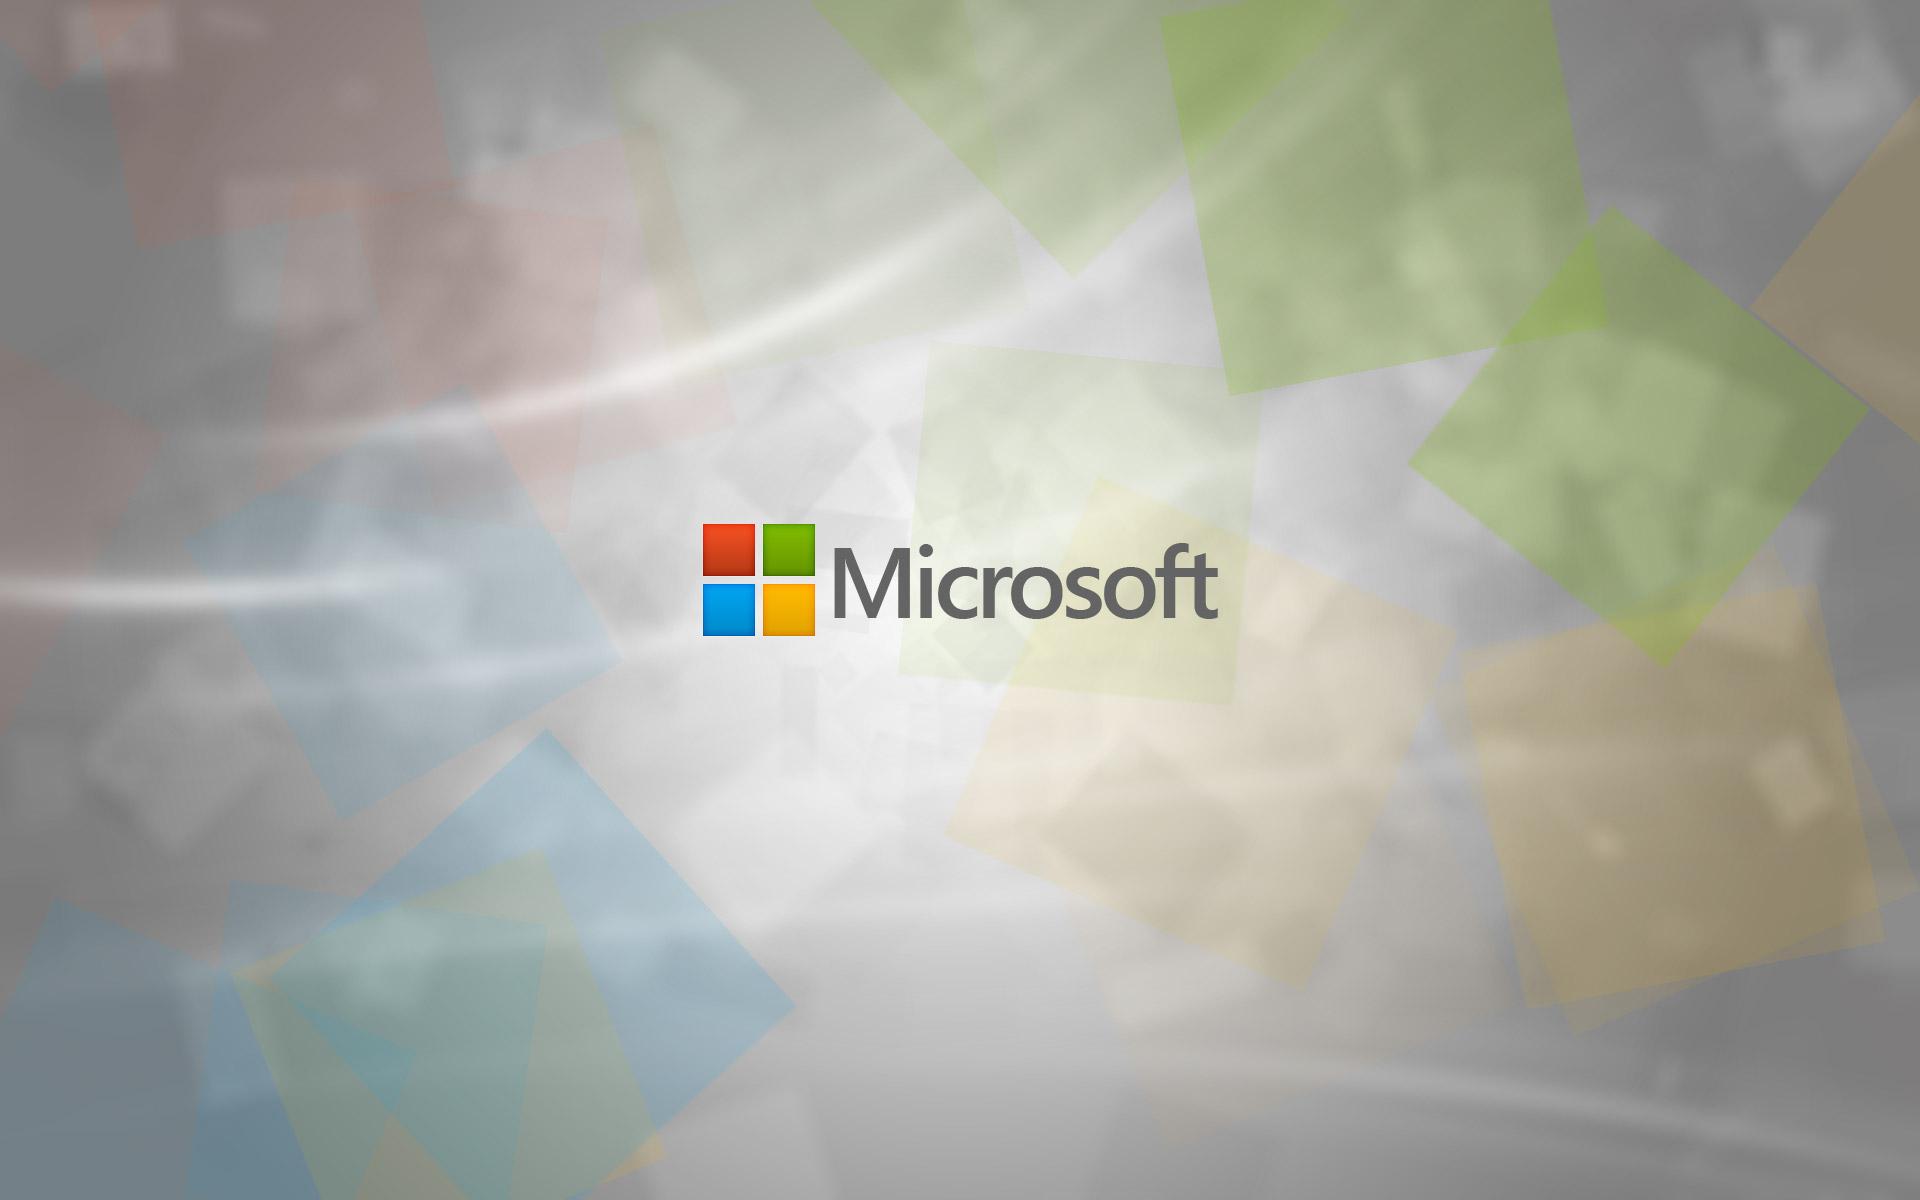 Microsoft Windows Background Wallpaper - WallpaperSafari